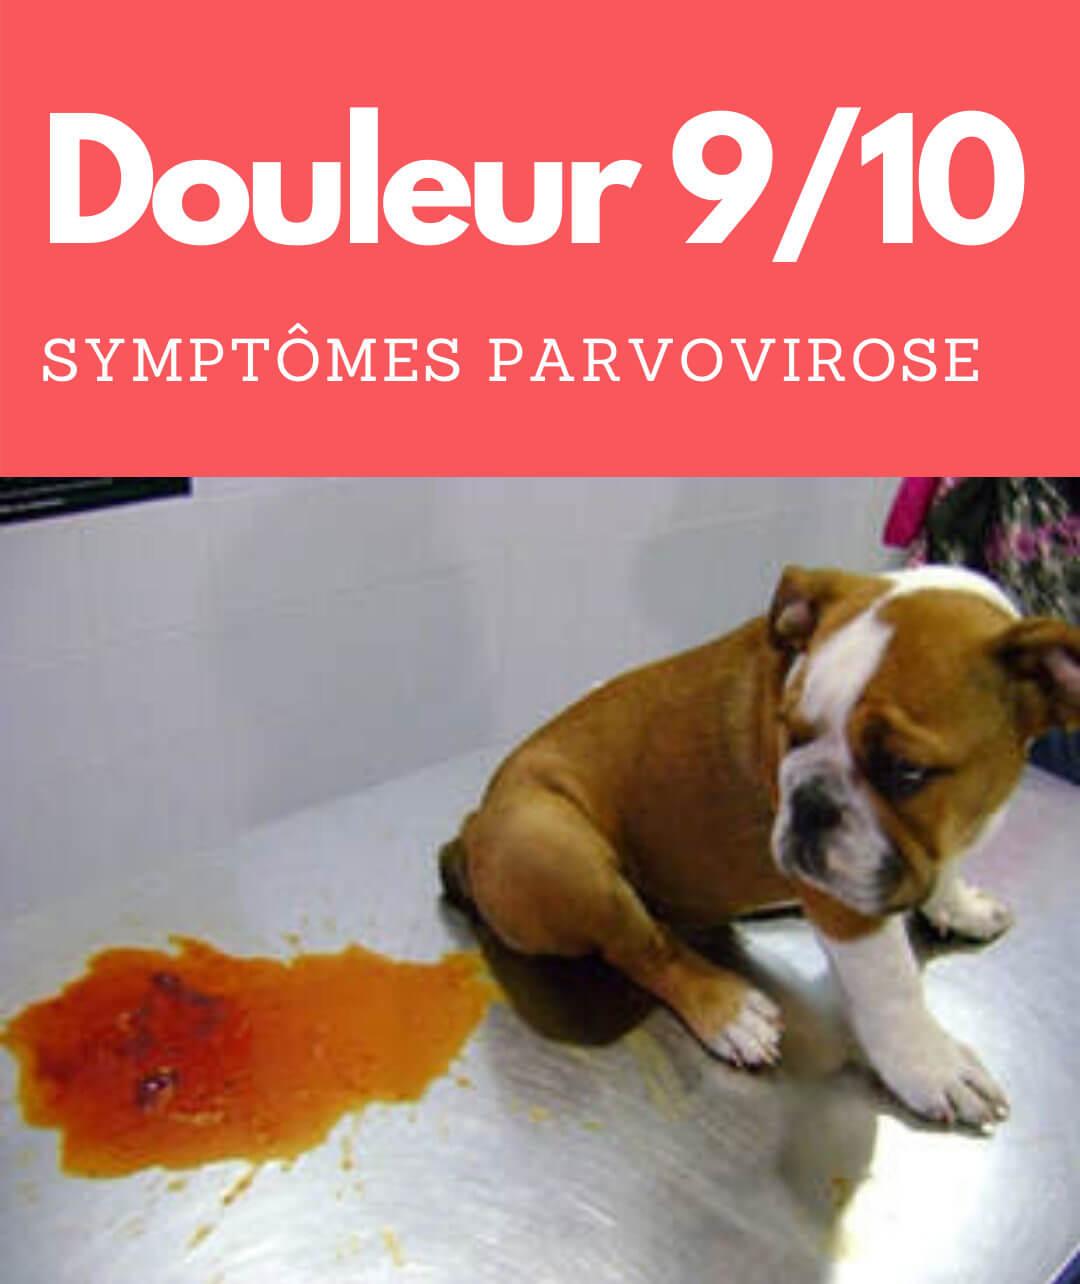 symptome de la parvovirose canine